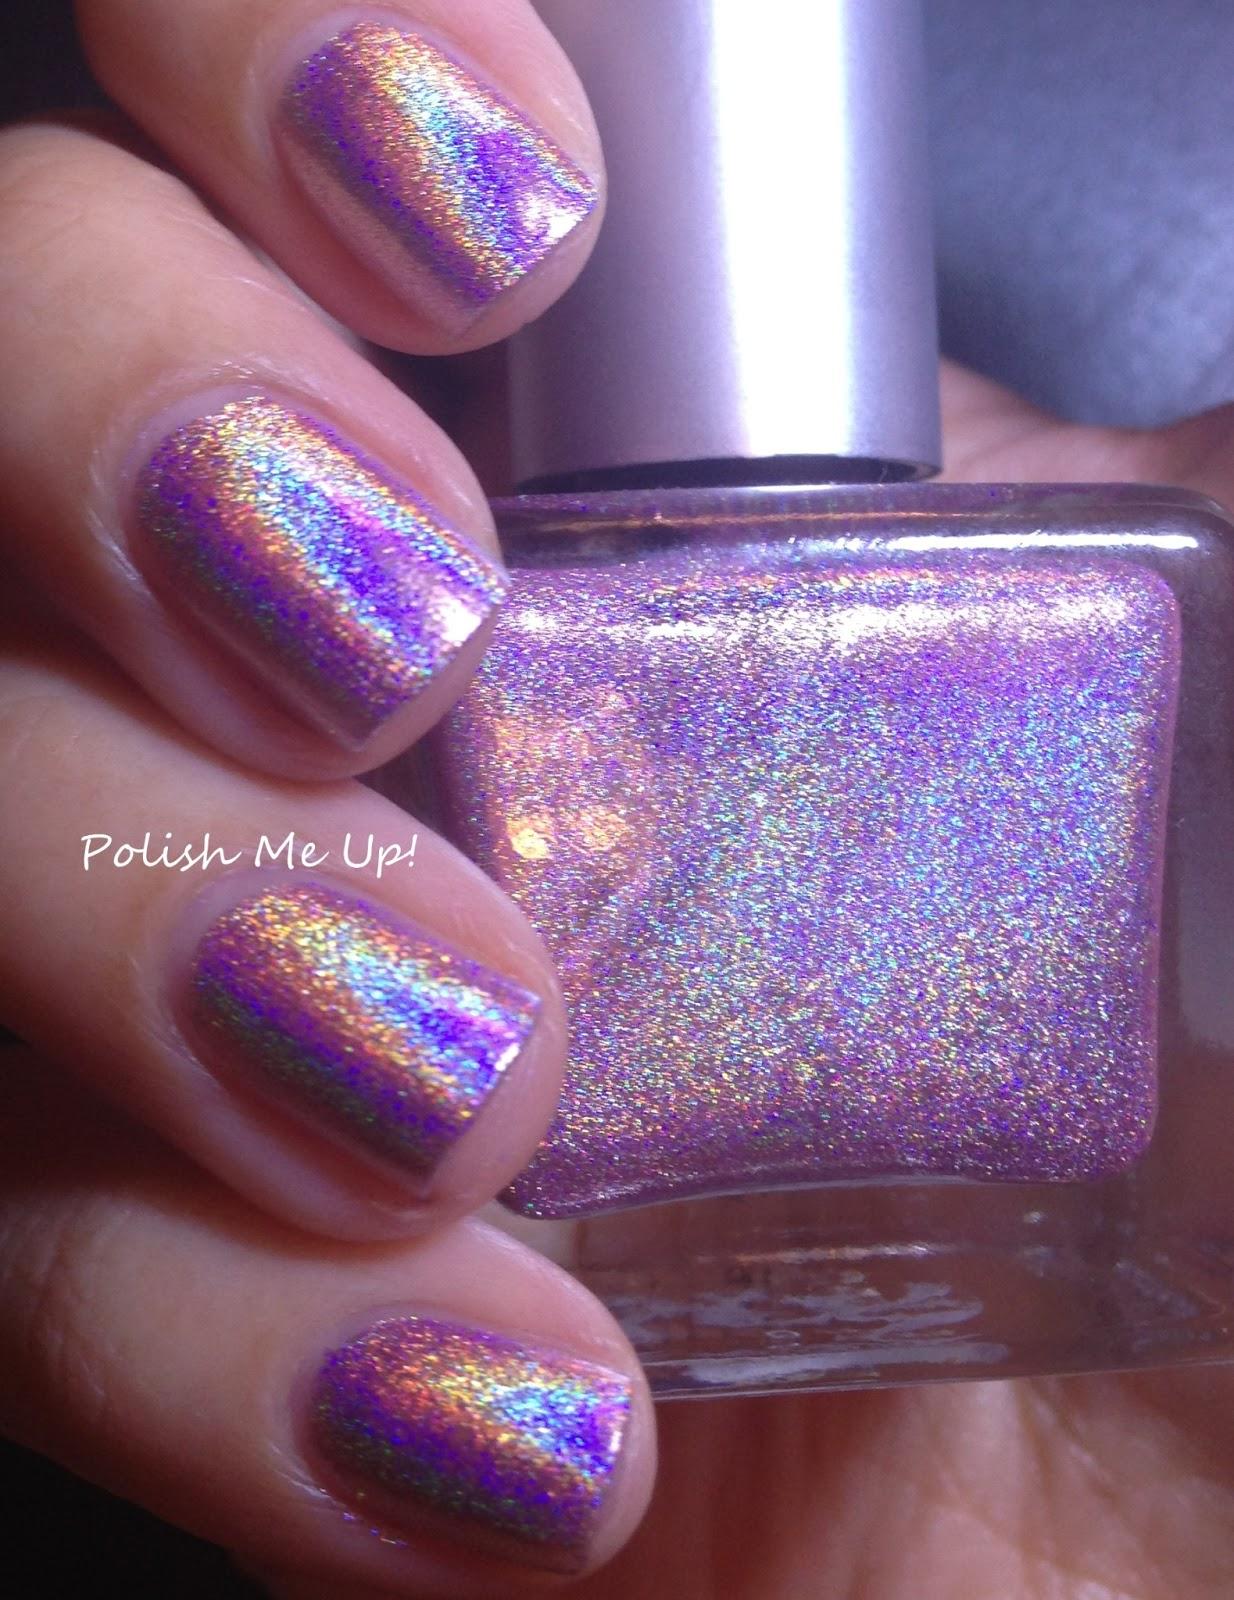 Polish Me Perfect: Polish Me Up!: Urban Outfitters Pink Holo